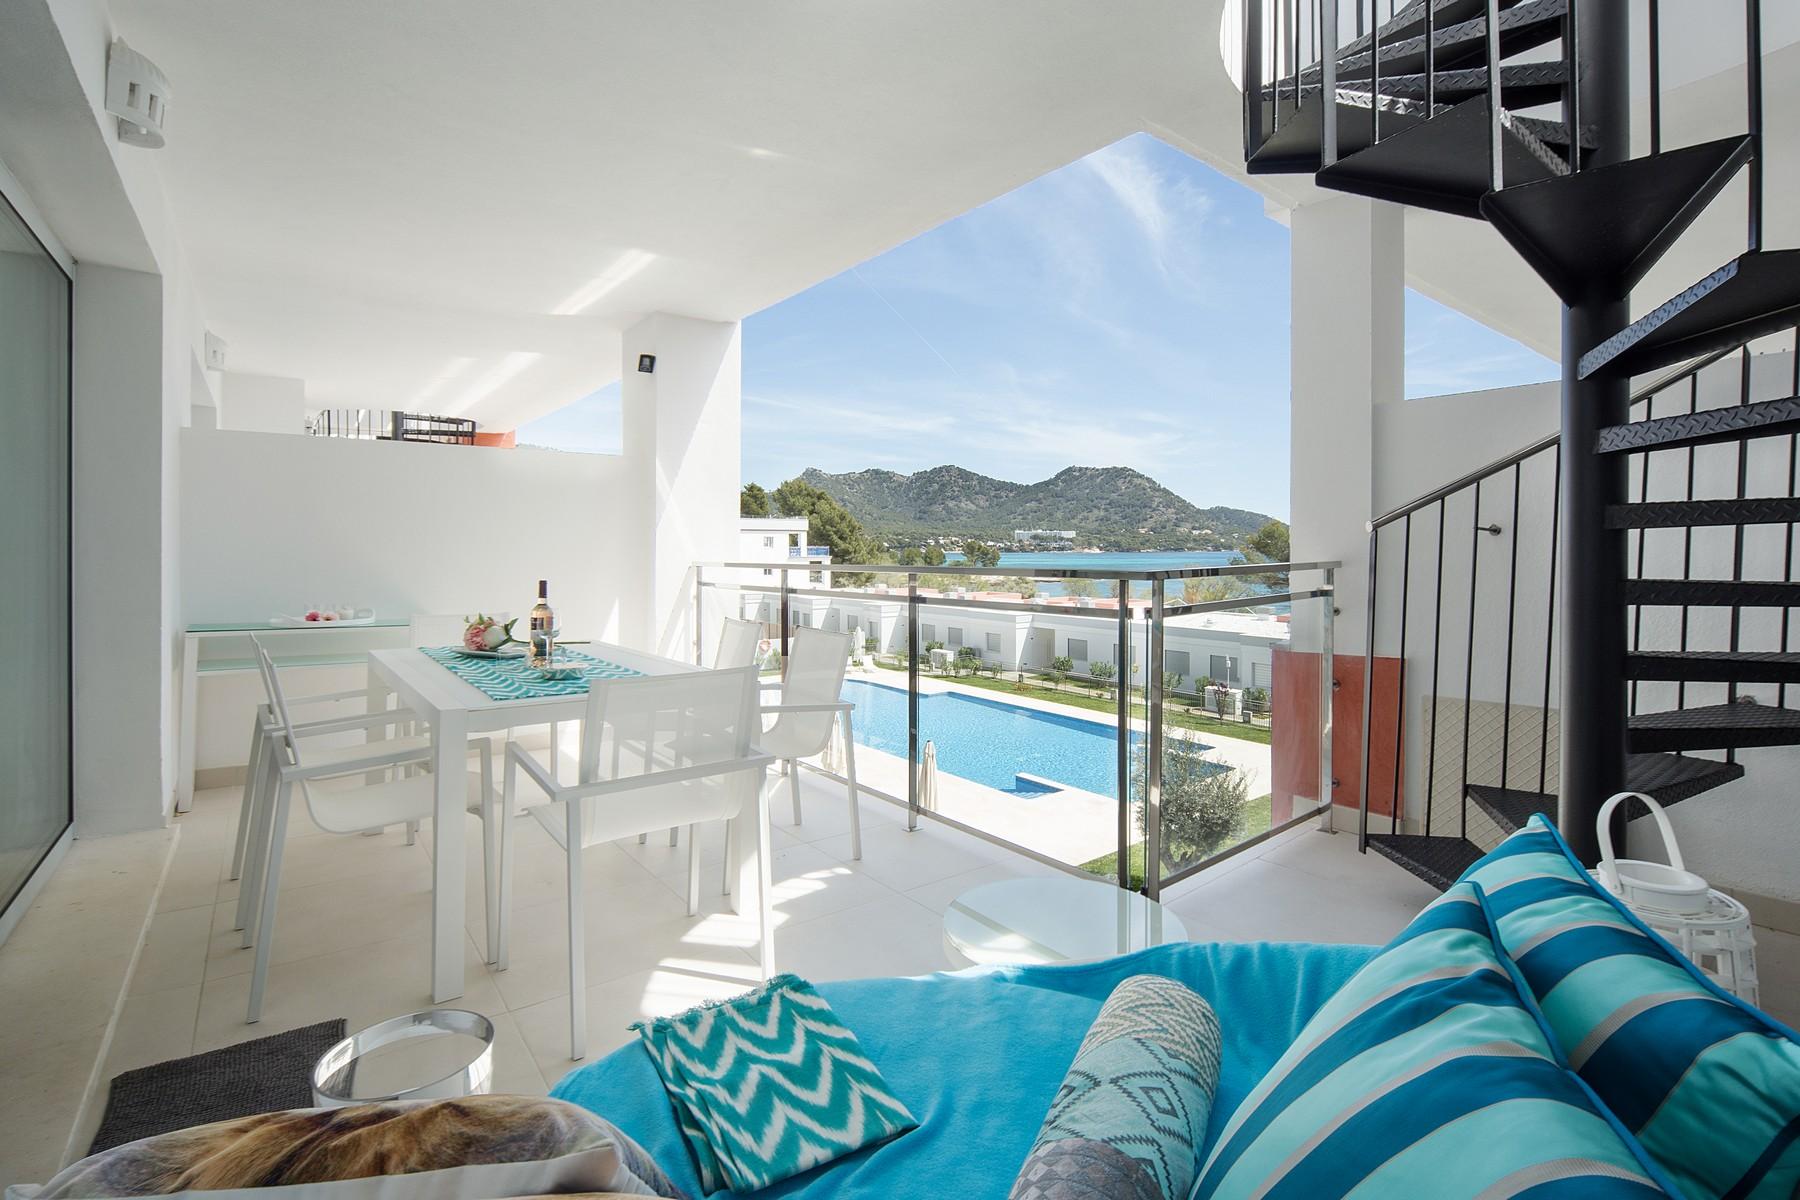 Casa Unifamiliar por un Alquiler en Penthouse with sea view in Costa de los Pinos Other Balearic Islands, Balearic Islands, España